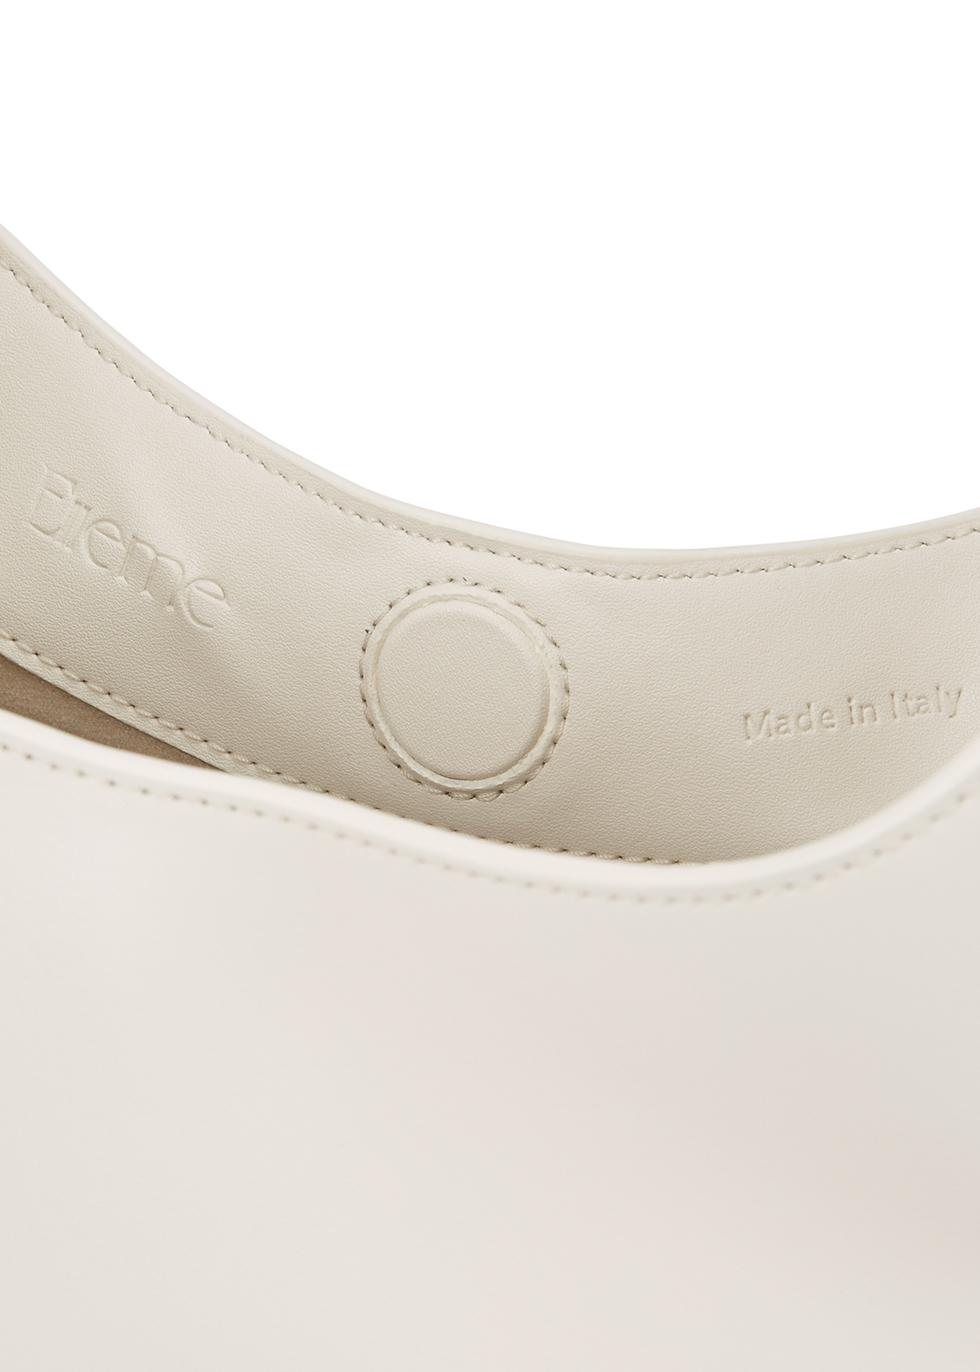 Baozi white leather top handle bag - ELLEME